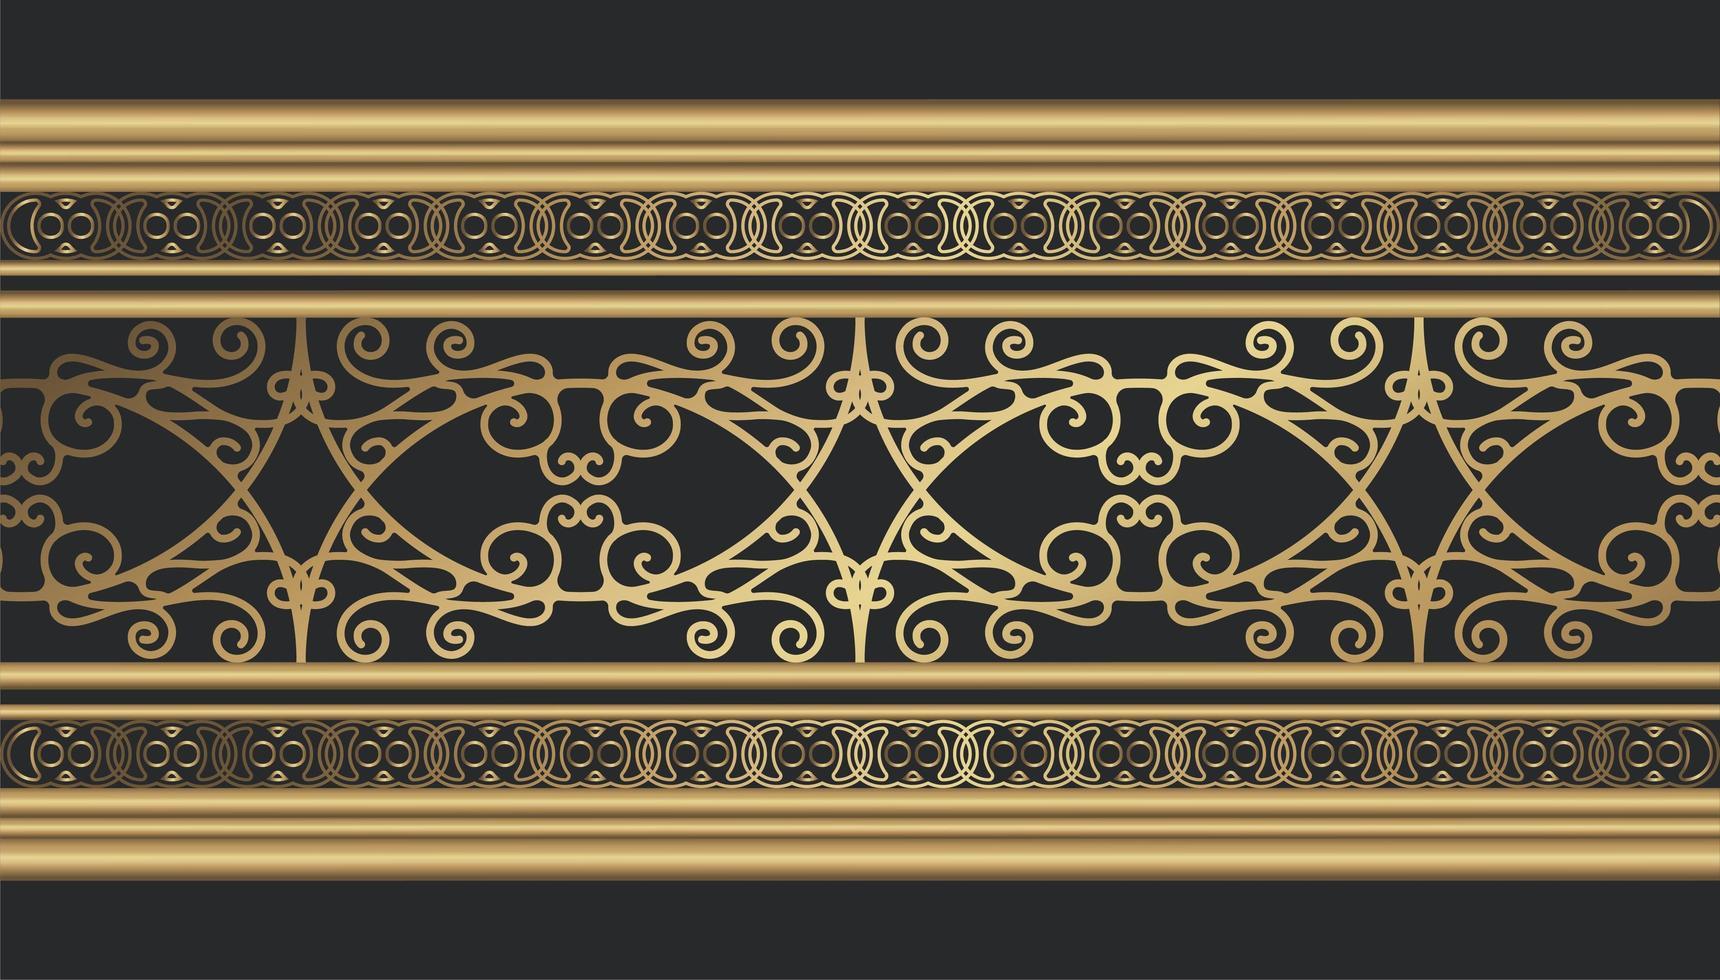 gyllene dekorativa gränsen vektor